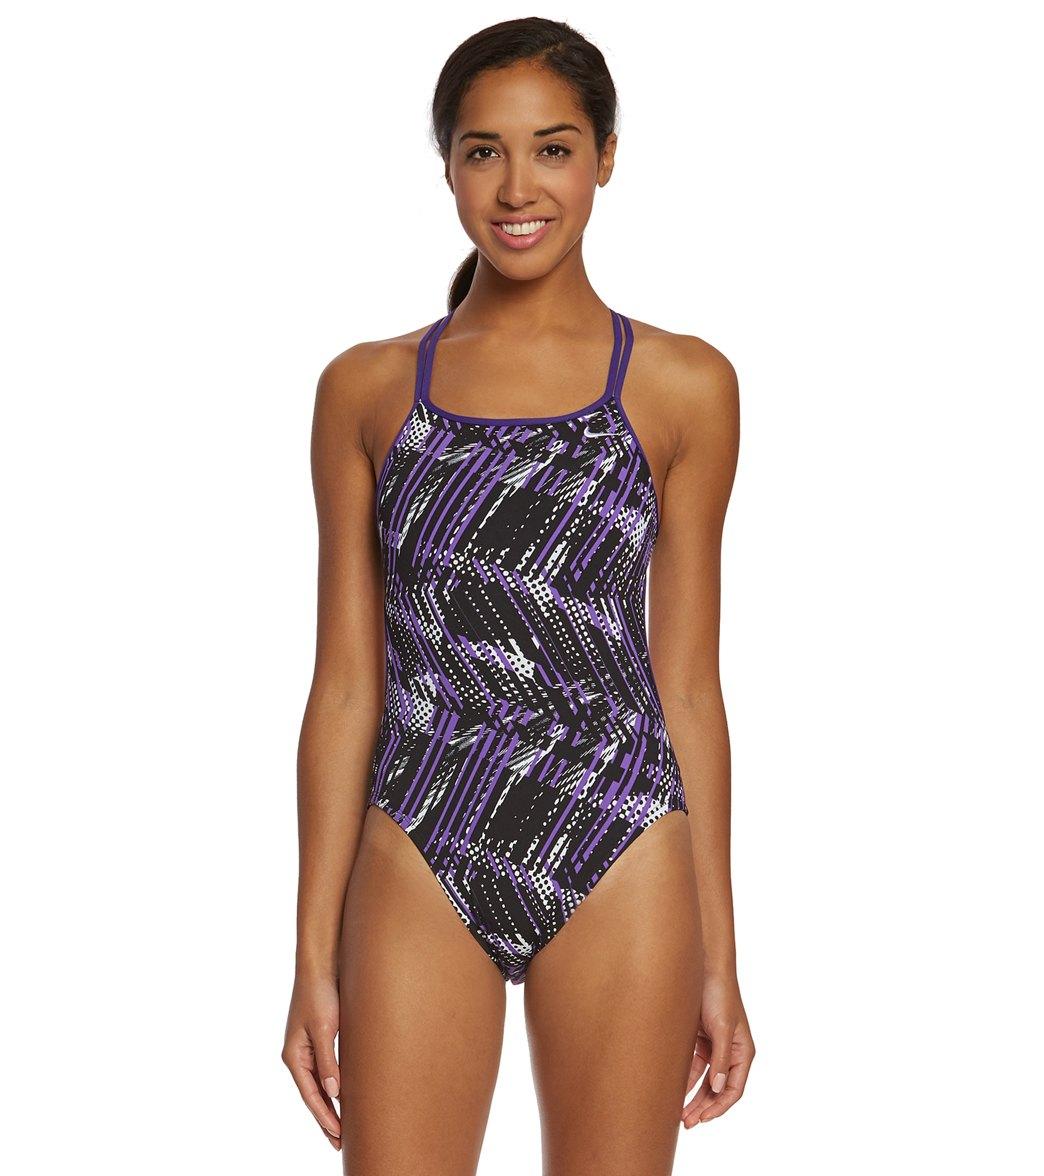 Nike Women's Shark Spiderback Tank One Piece Swimsuit